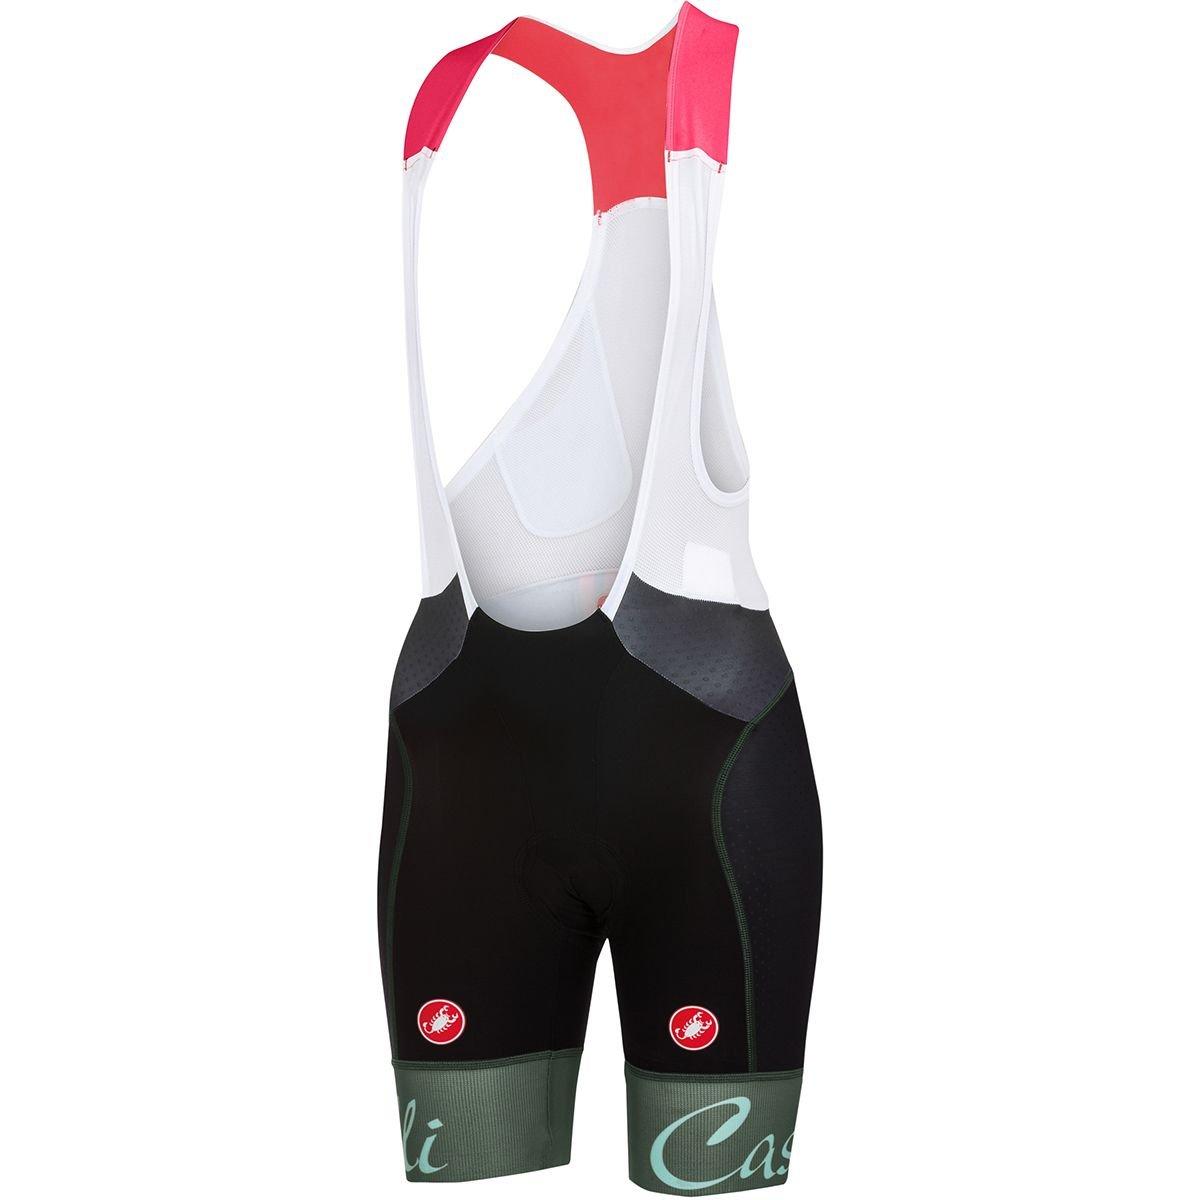 Castelli Free Aero Bib Shorts – Women 's B079C6DGRR Medium|Black/Forest Gray Black/Forest Gray Medium